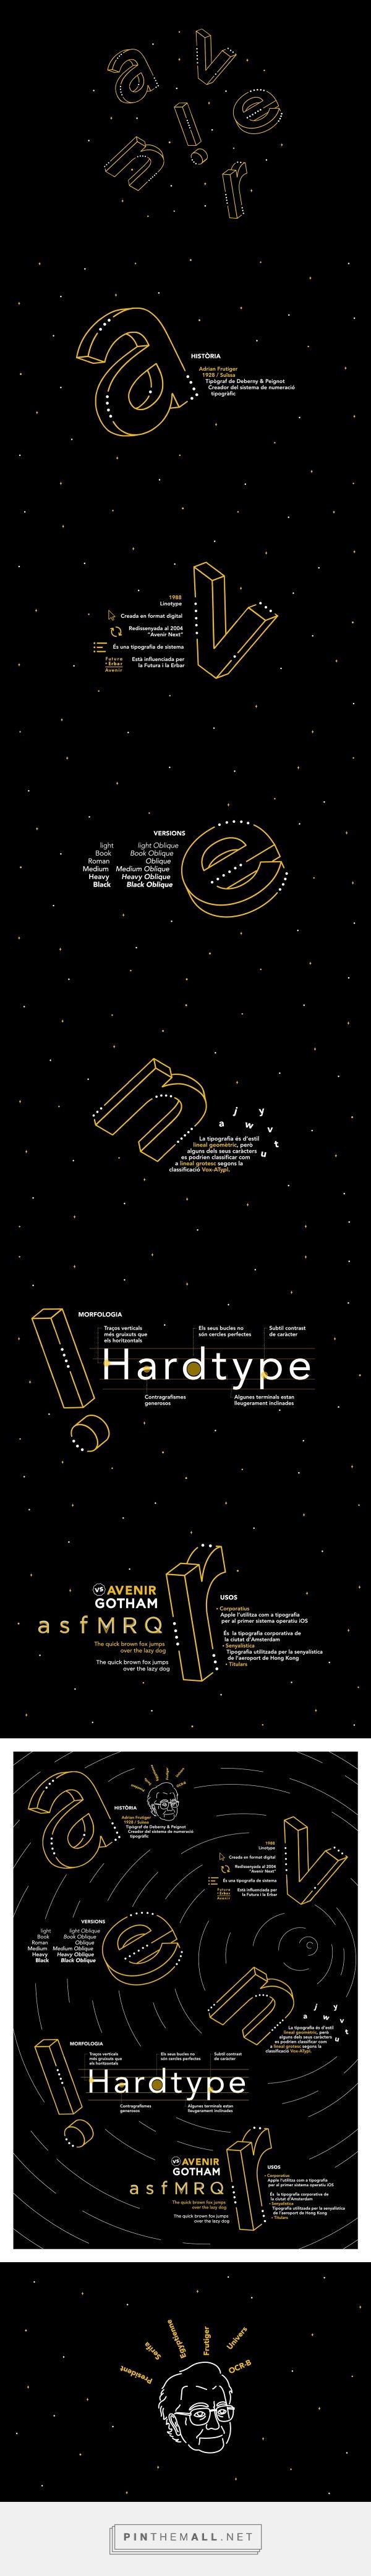 Avenir Infographic By Dani Cirac Corbi Design Grafico Layout Design